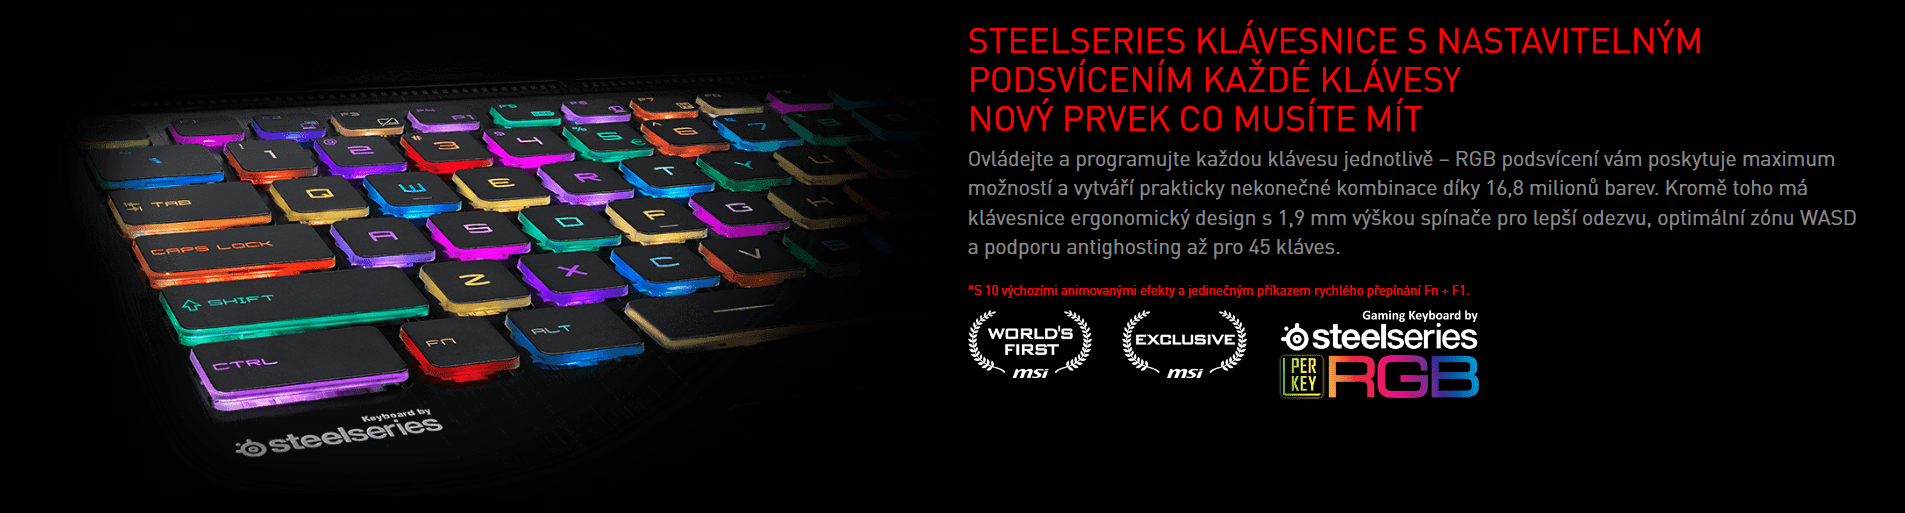 SteelSeries klávesnice